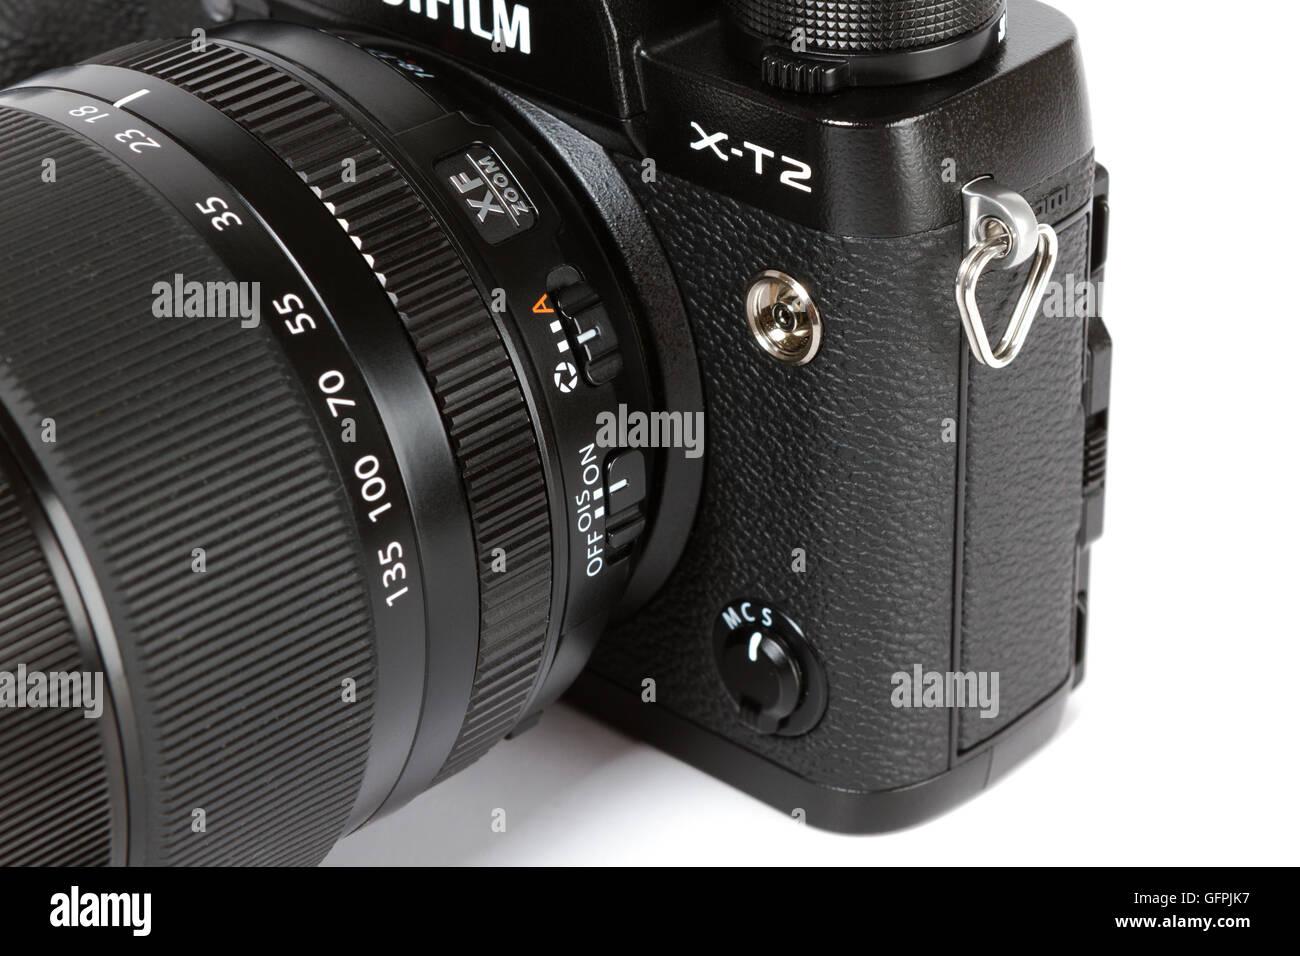 detail on  FUJIFILM X-T2, 24 megapixels, 4K video mirrorless camera fon white background - Stock Image